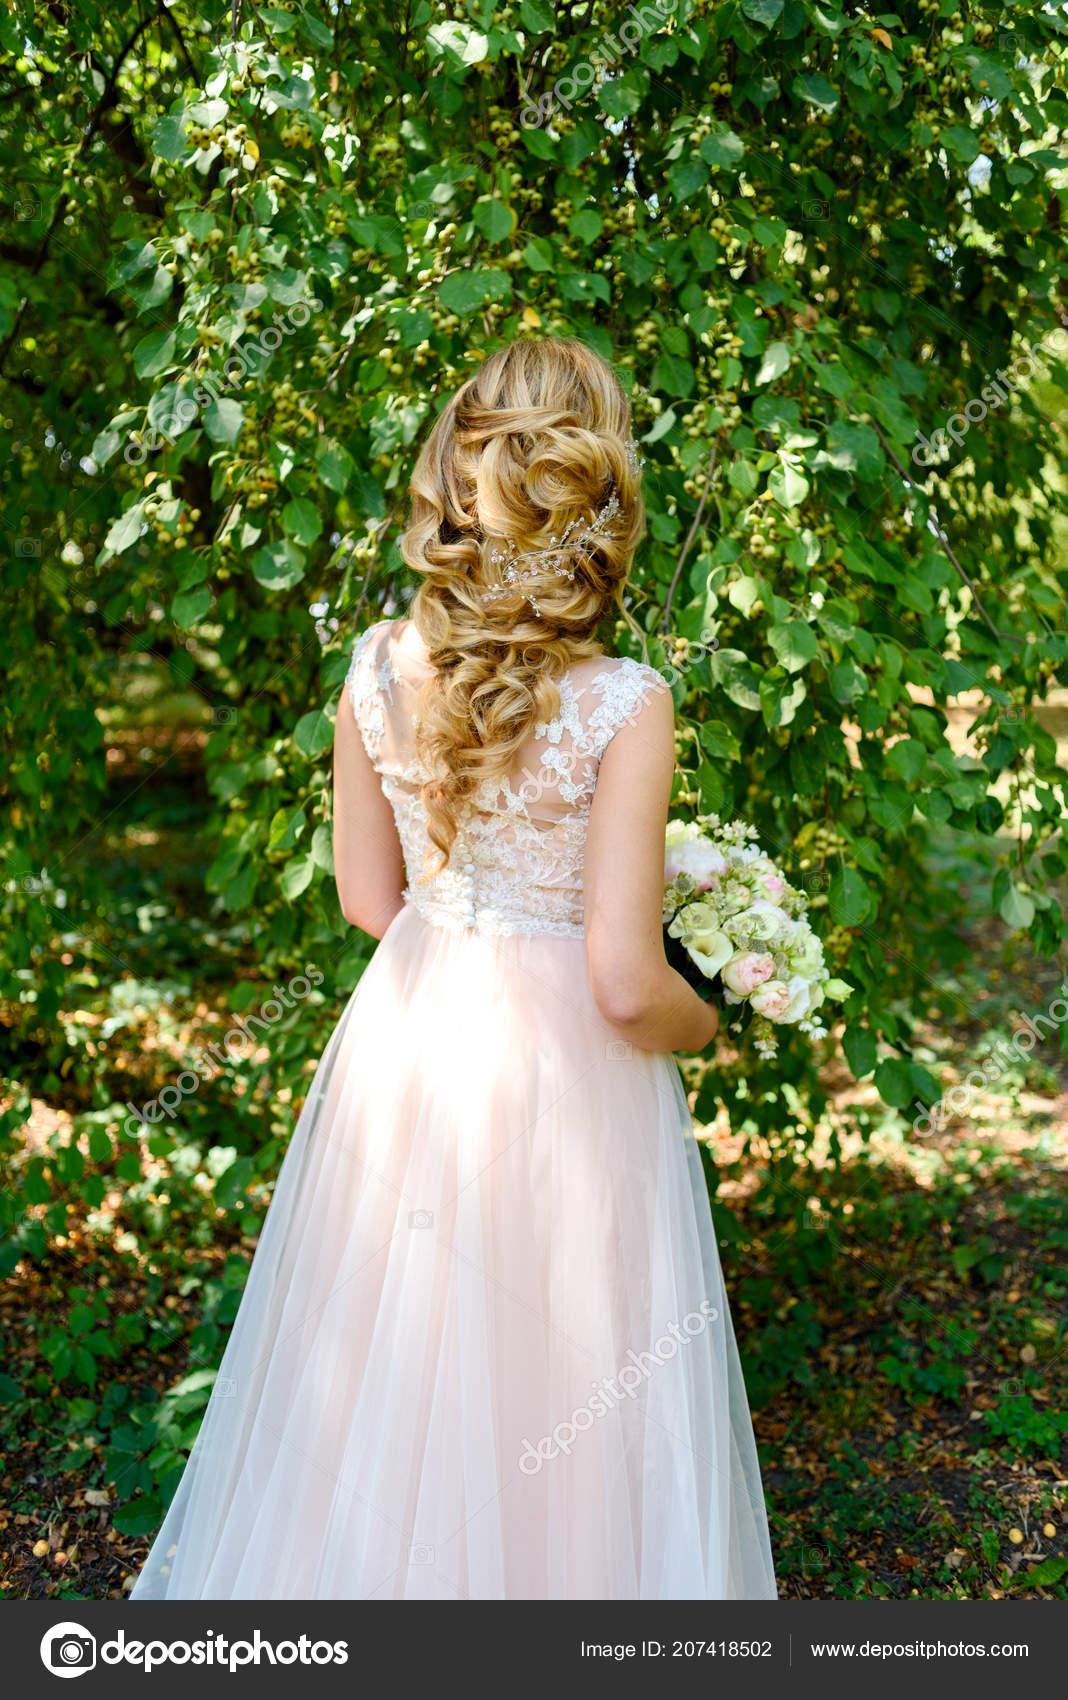 Beautiful Bride Wedding Dress Bridal Bouquet Park Outdoors Back View Stock Photo C D Duda 207418502